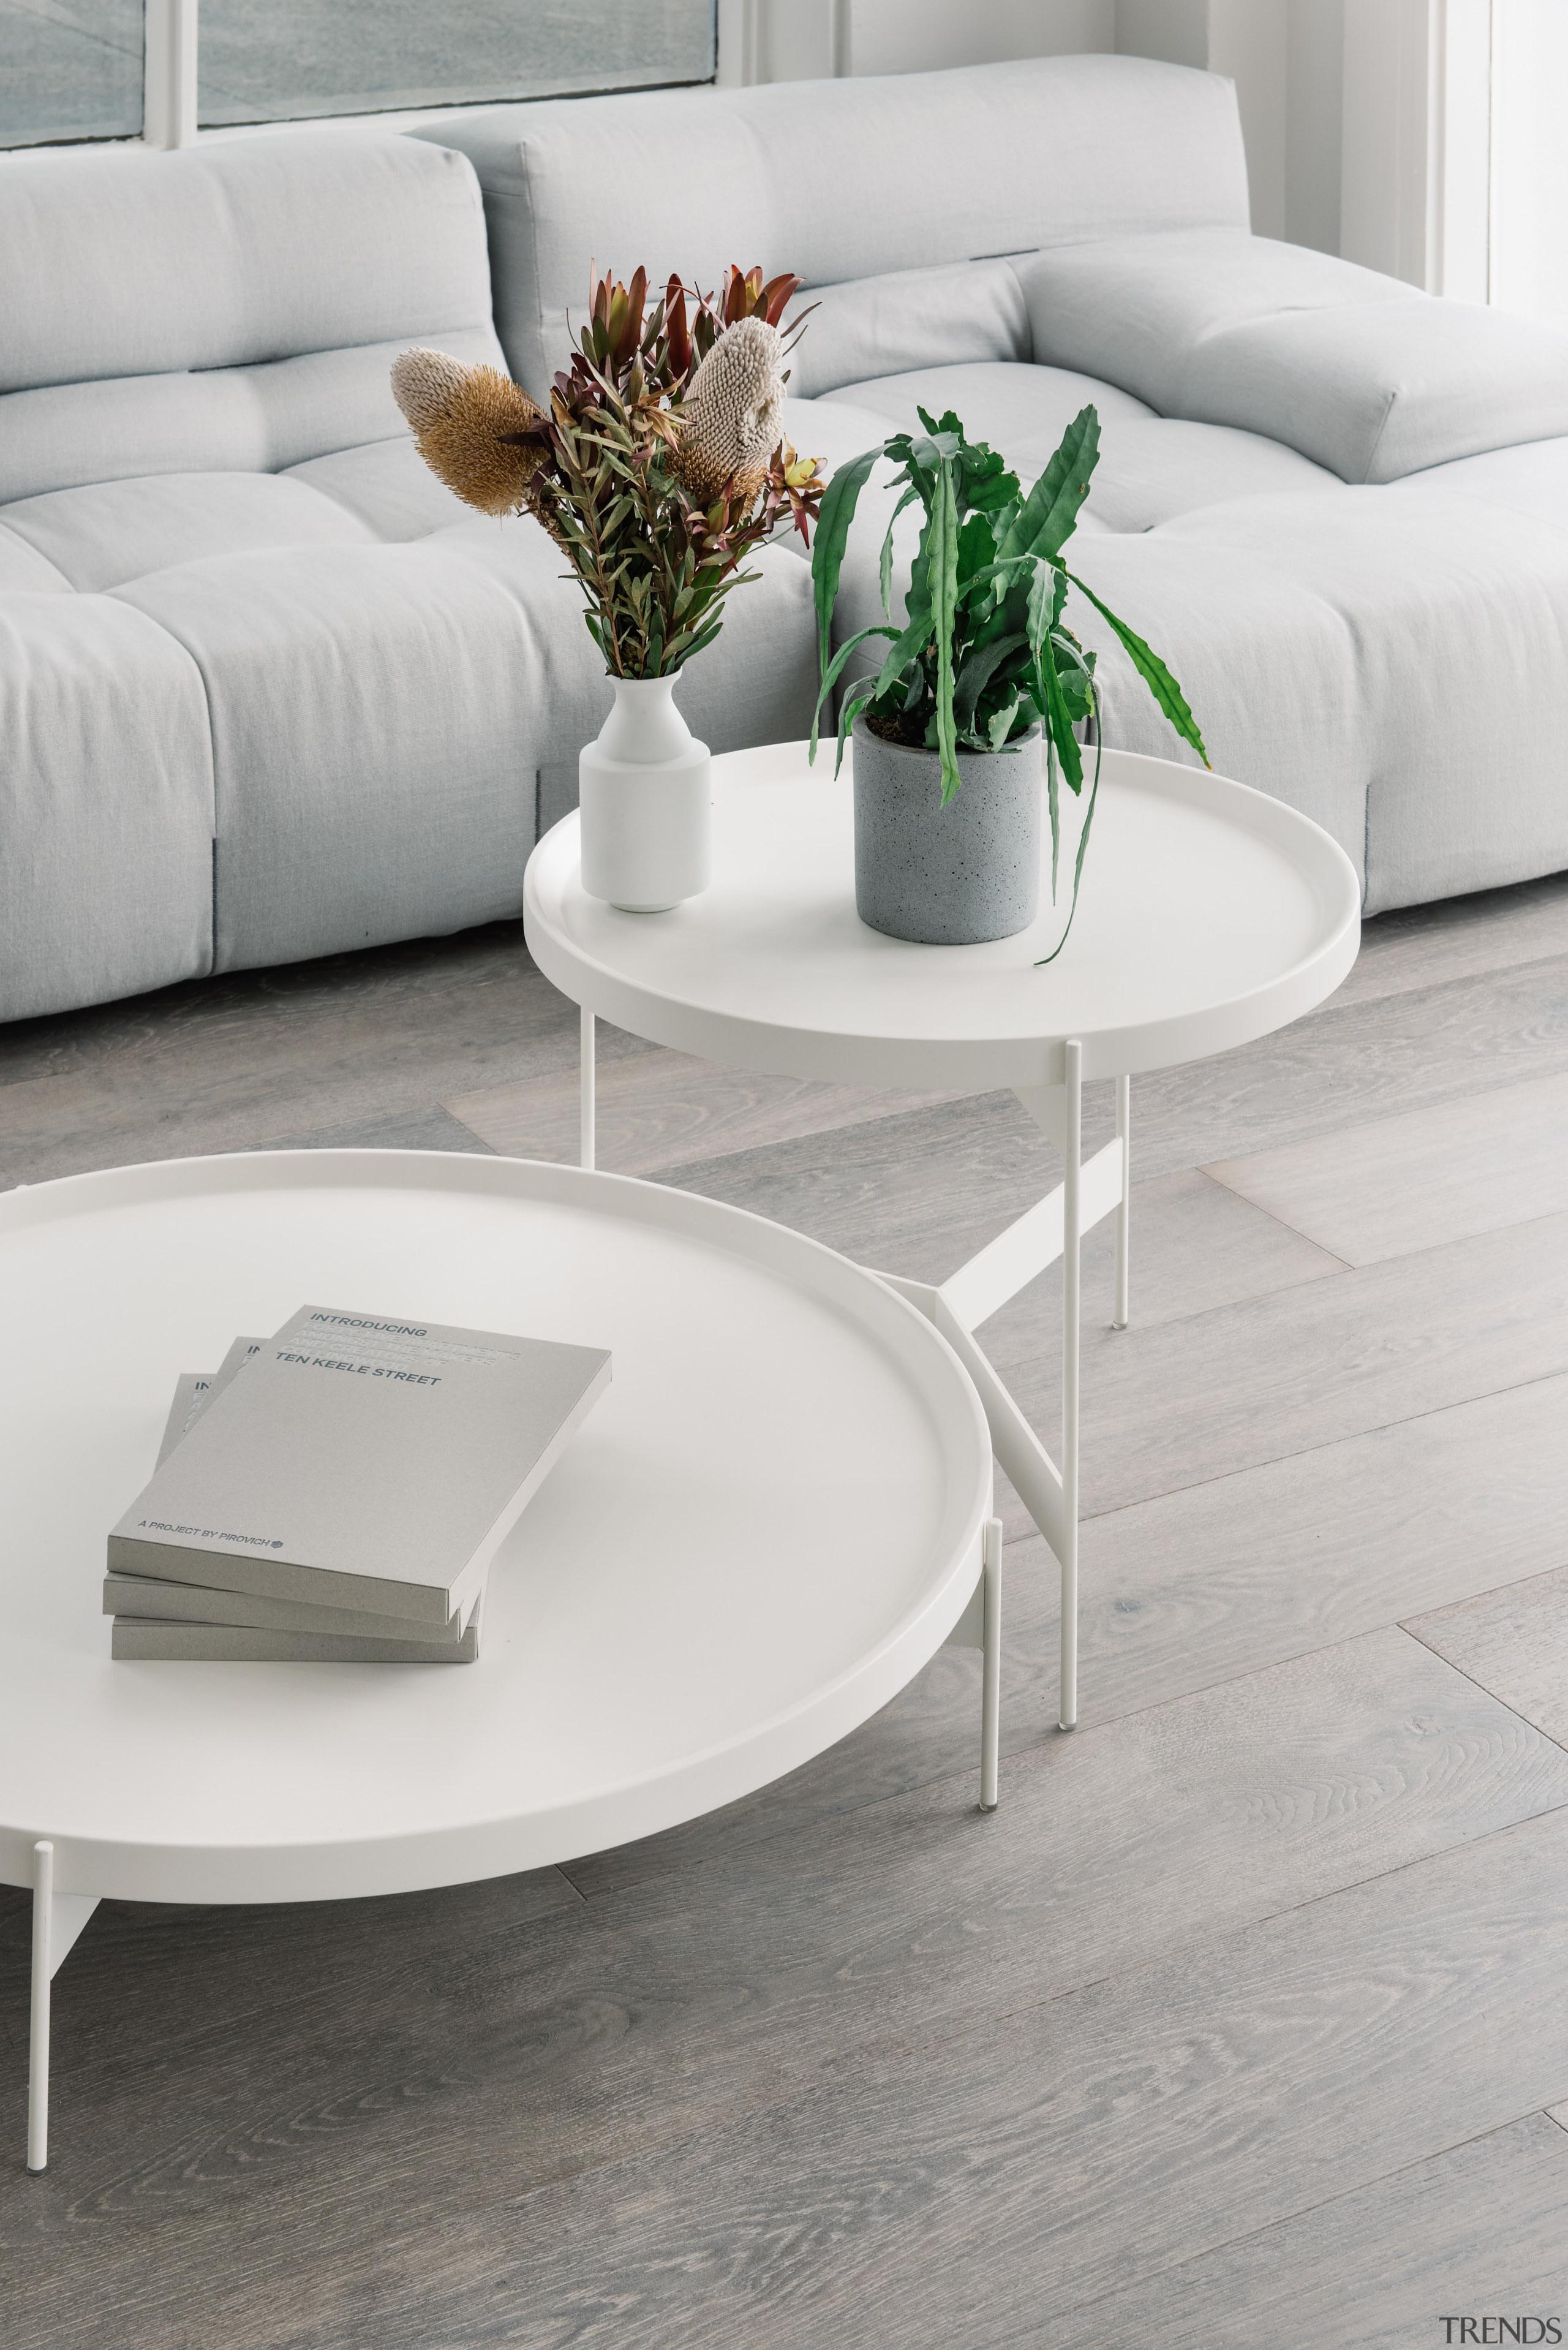 French Oak floor Driftwood has a pale grey angle, coffee table, floor, flooring, furniture, hardwood, interior design, laminate flooring, living room, product design, table, wood flooring, gray